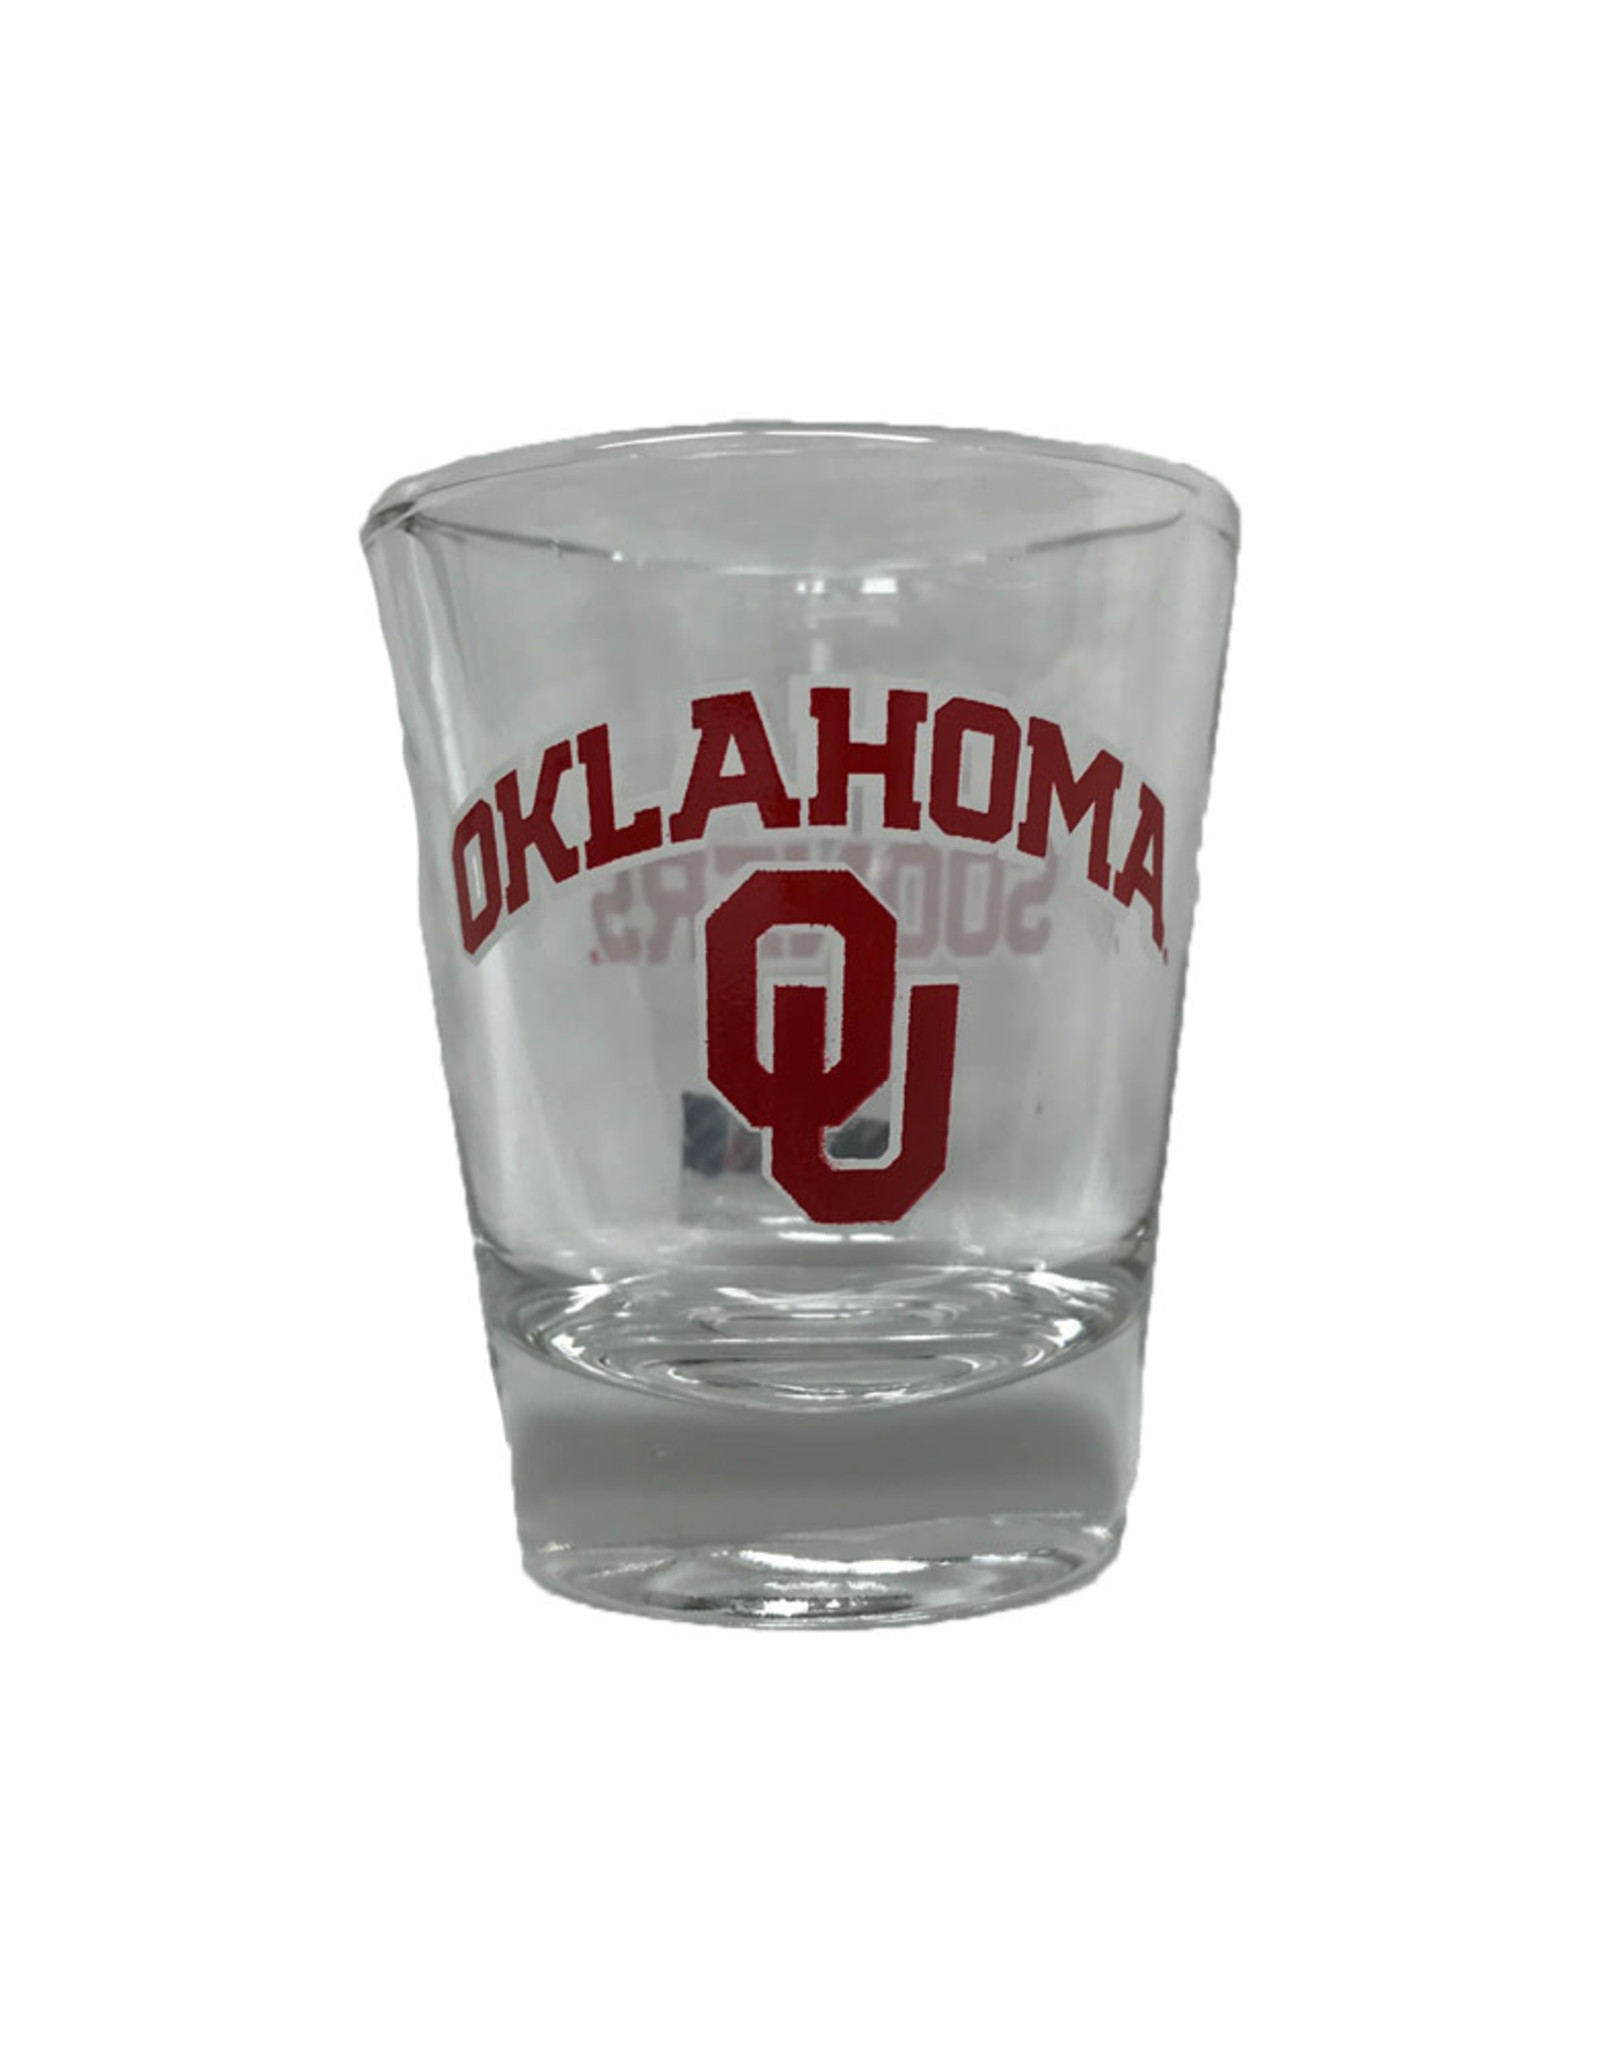 RFSJ Oklahoma OU Sooners 1.5 oz Shot Glass